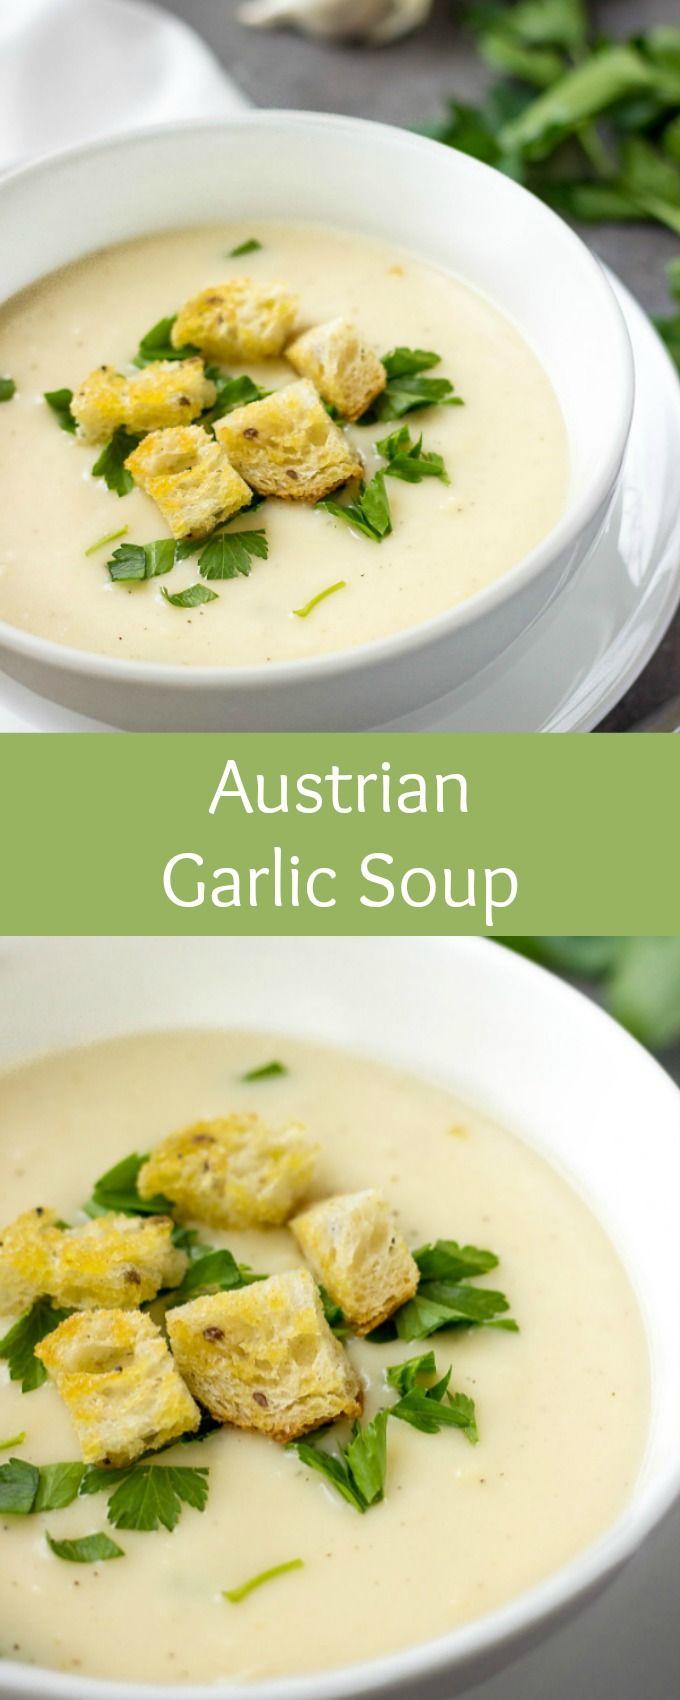 Austrian Garlic Soup With Croutons via @https://www.pinterest.com/lavenderandmcrn/